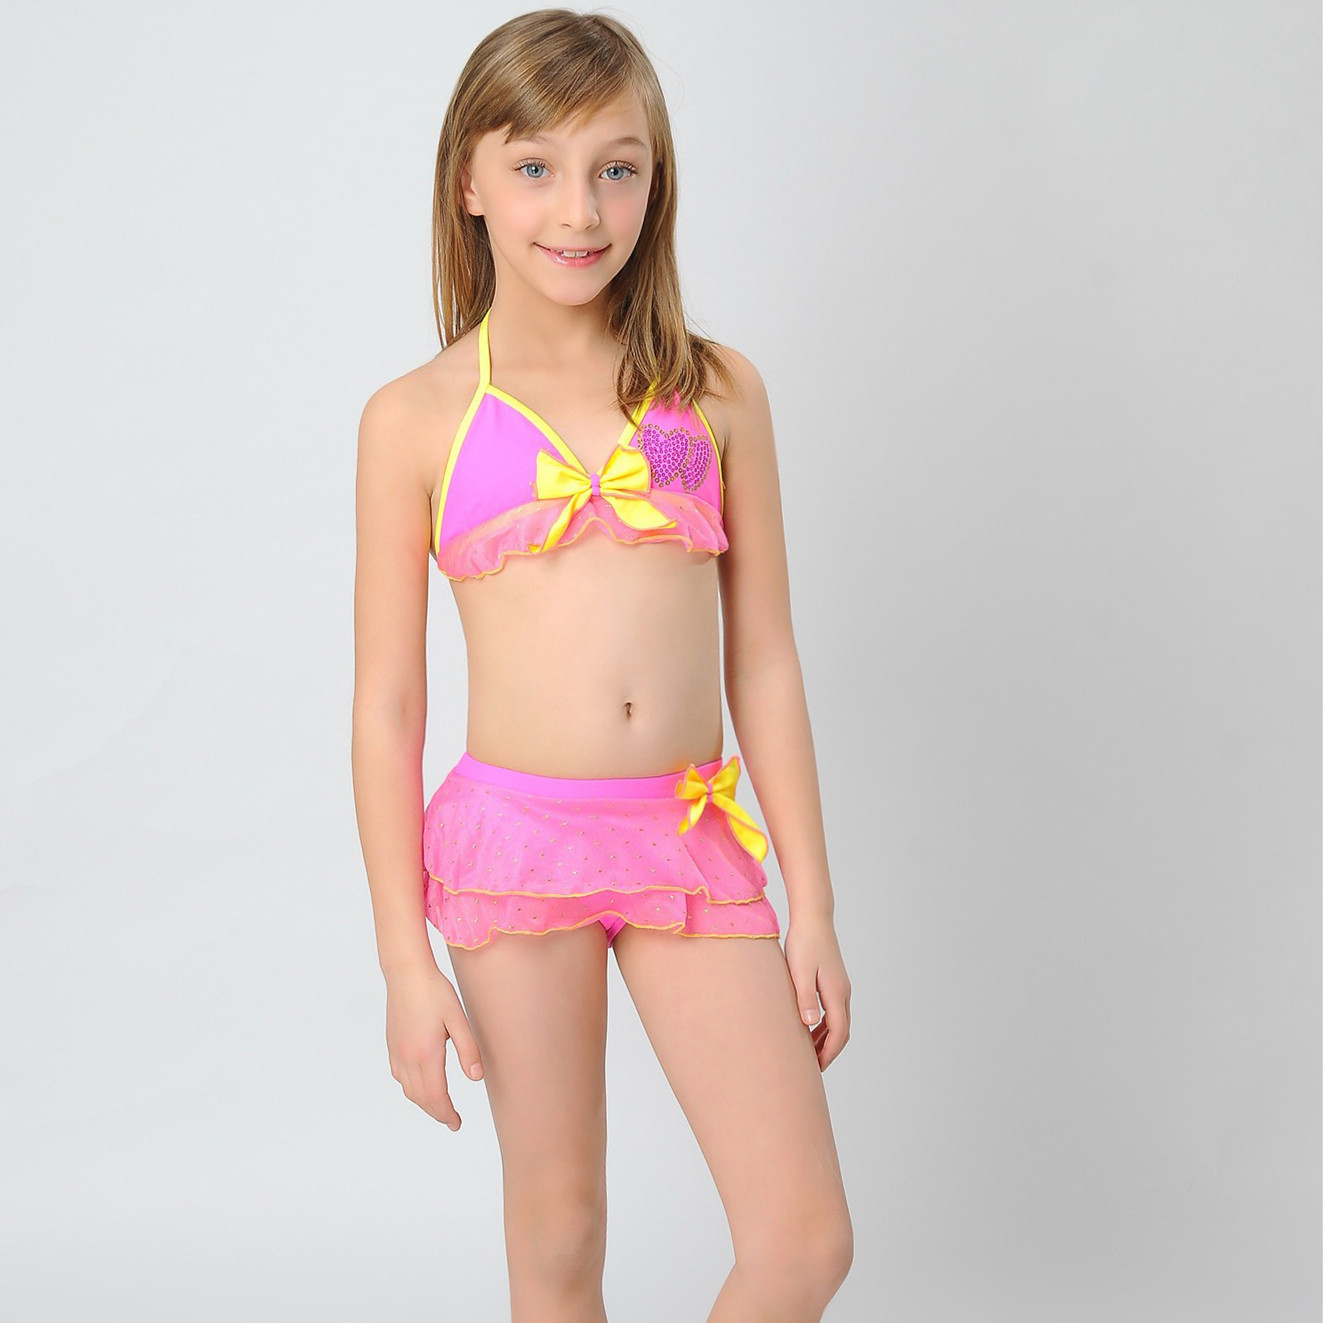 Hot latina in mini skirt big tits